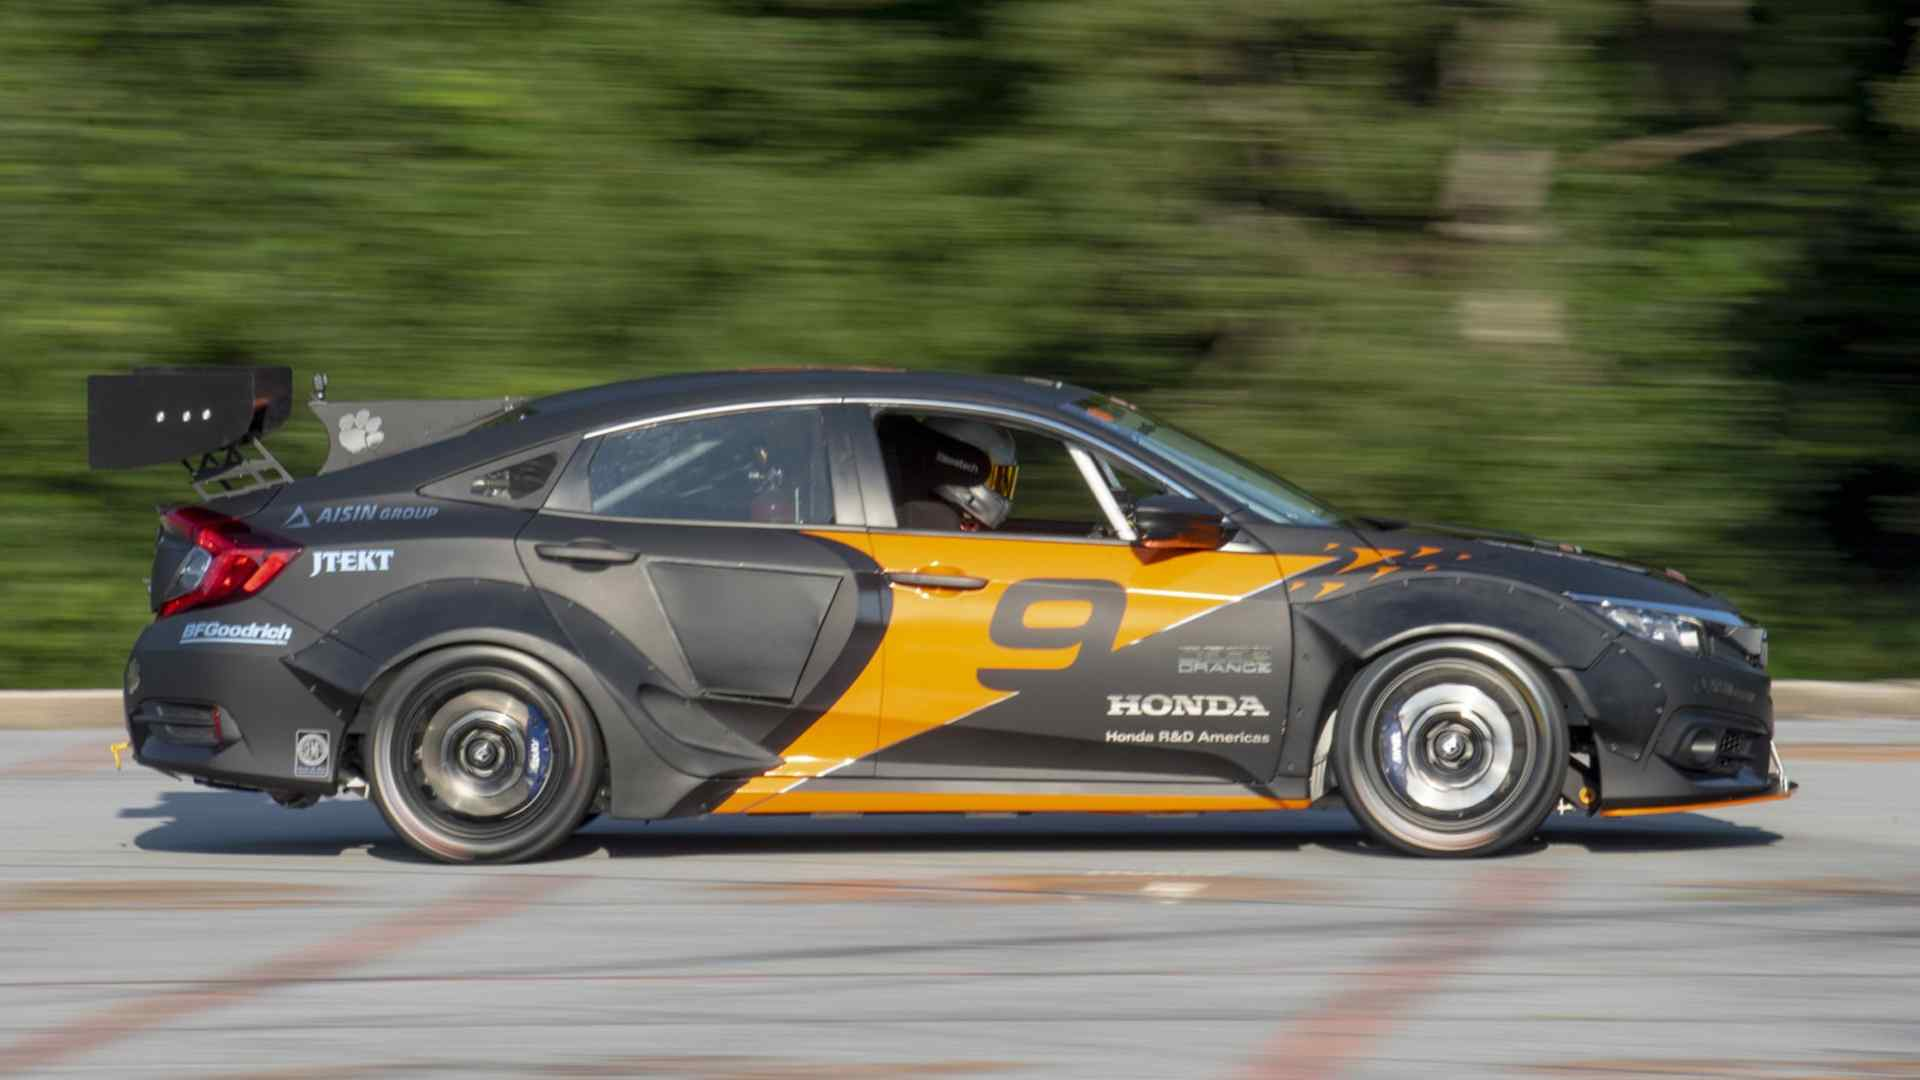 Deep Orange 9 Is A 600 Horsepower Honda Civic Hybrid Race Car